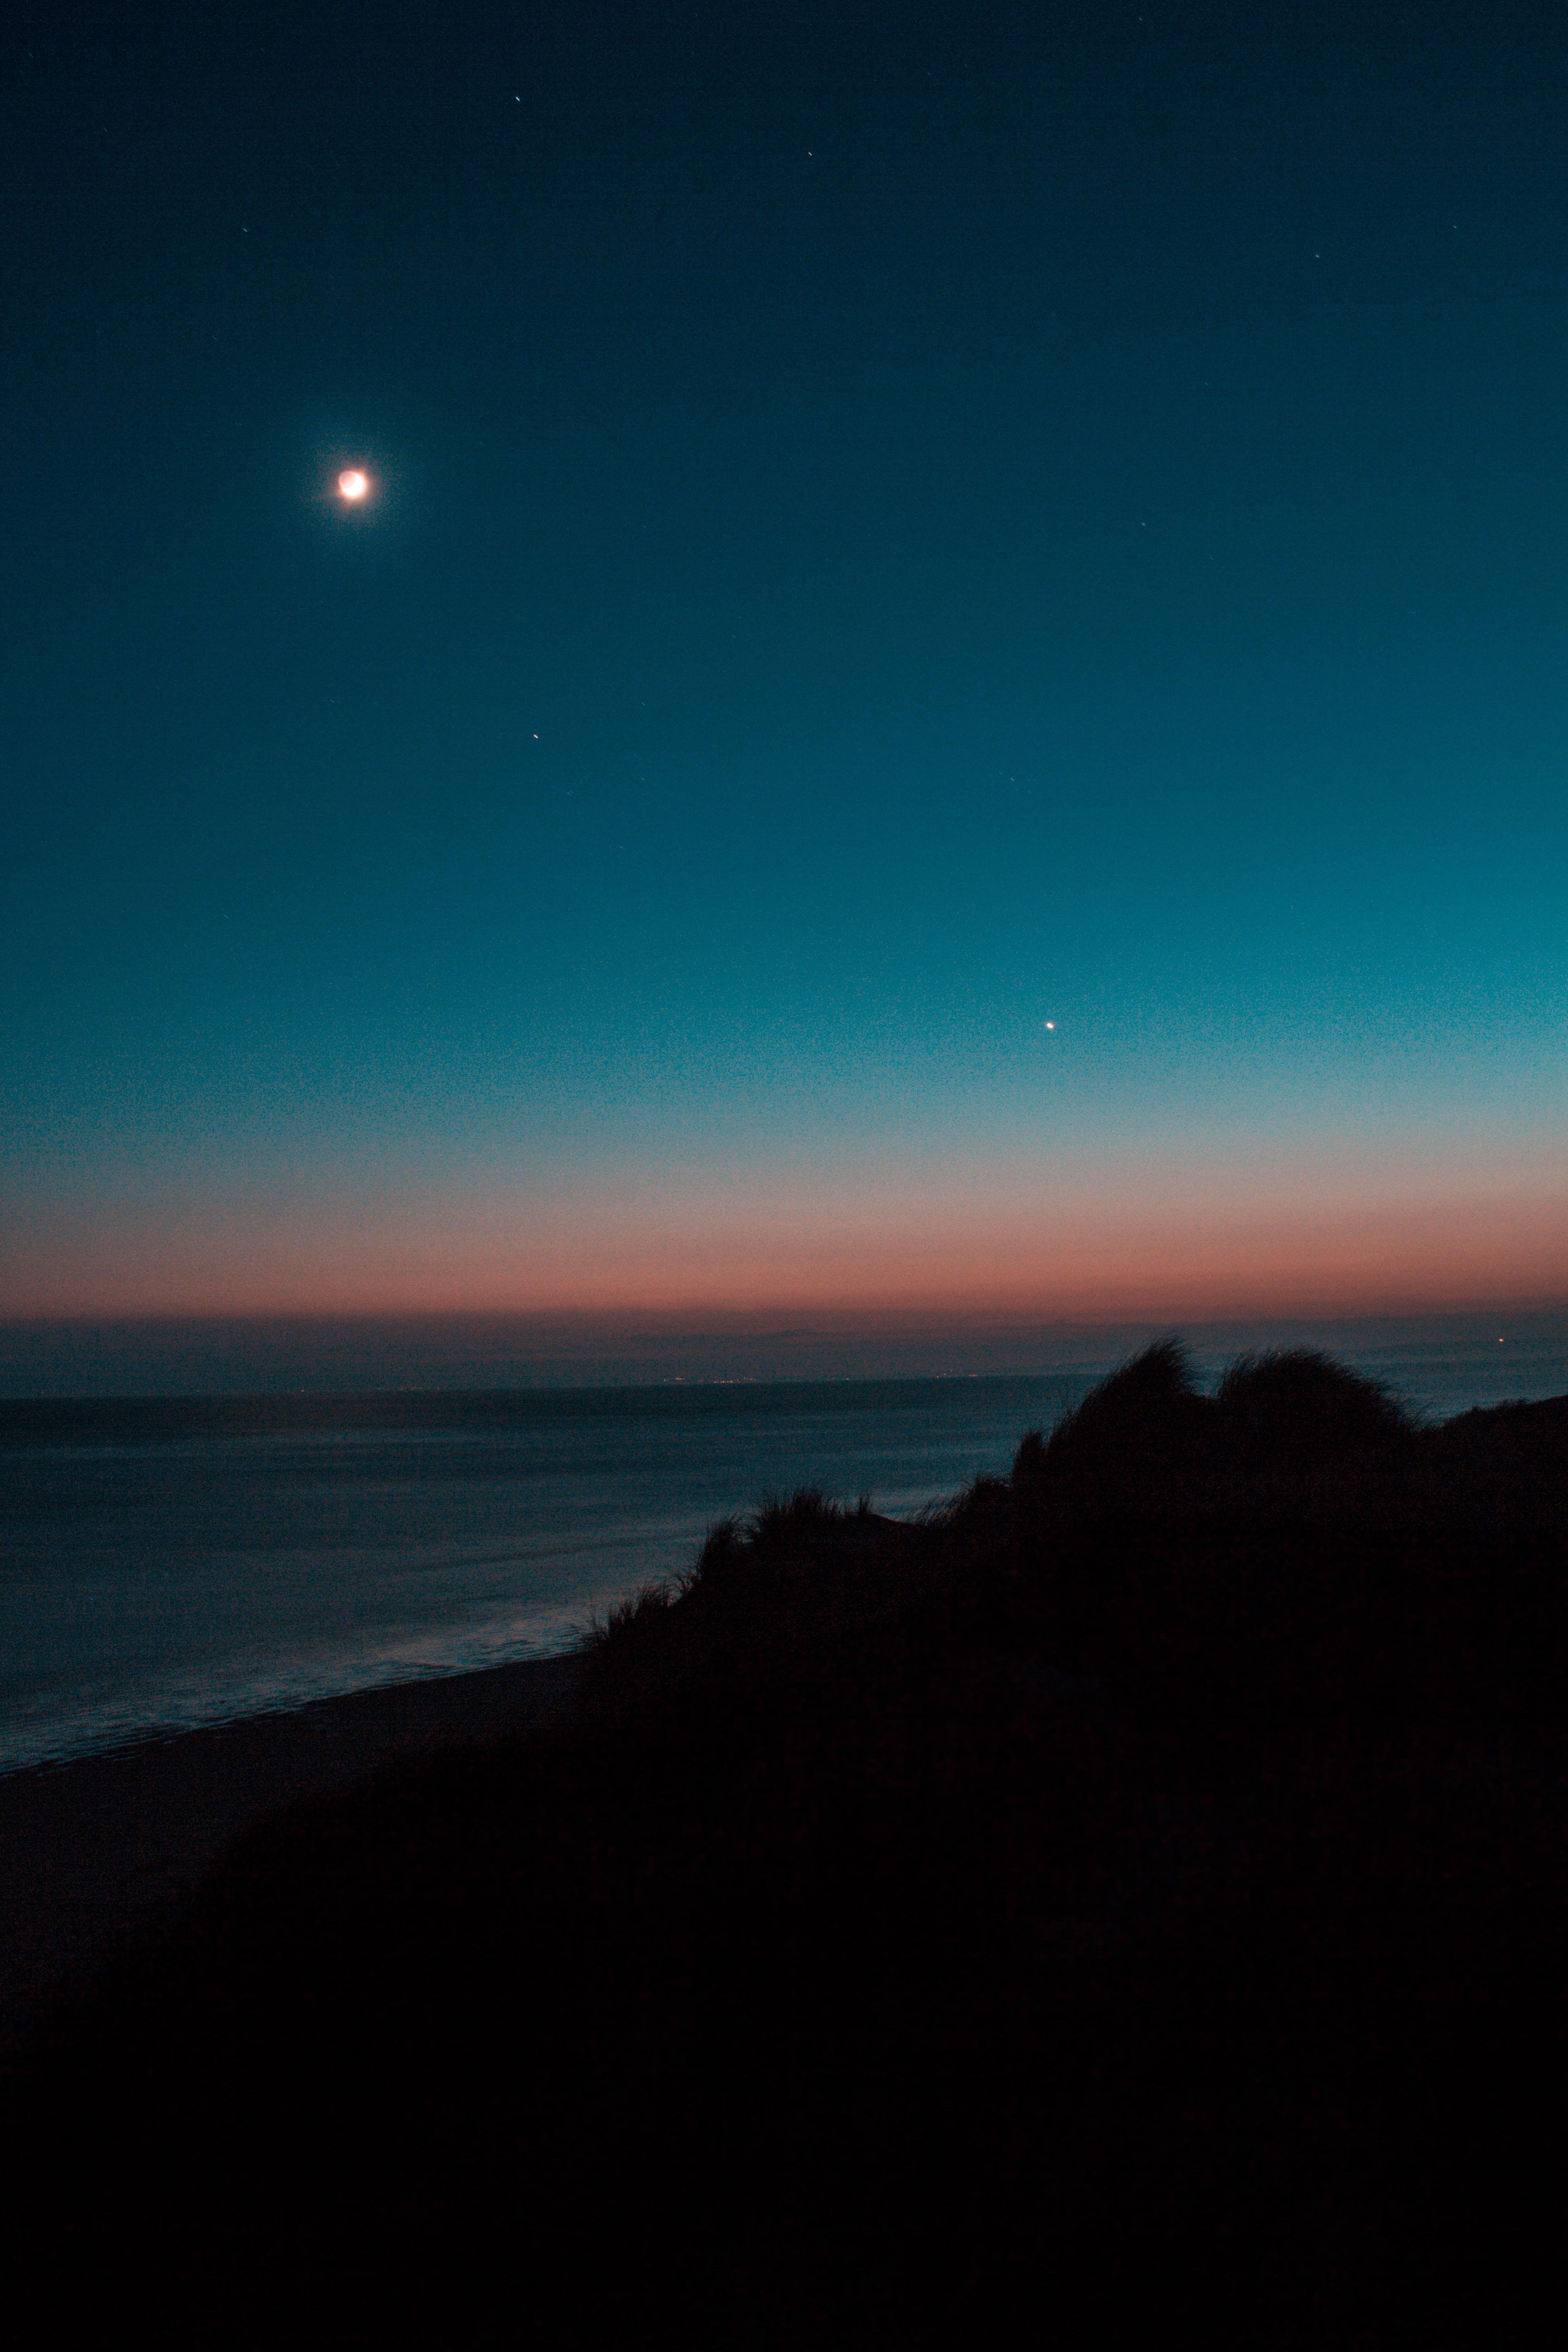 landscape photography of seashore against blue and orange skies